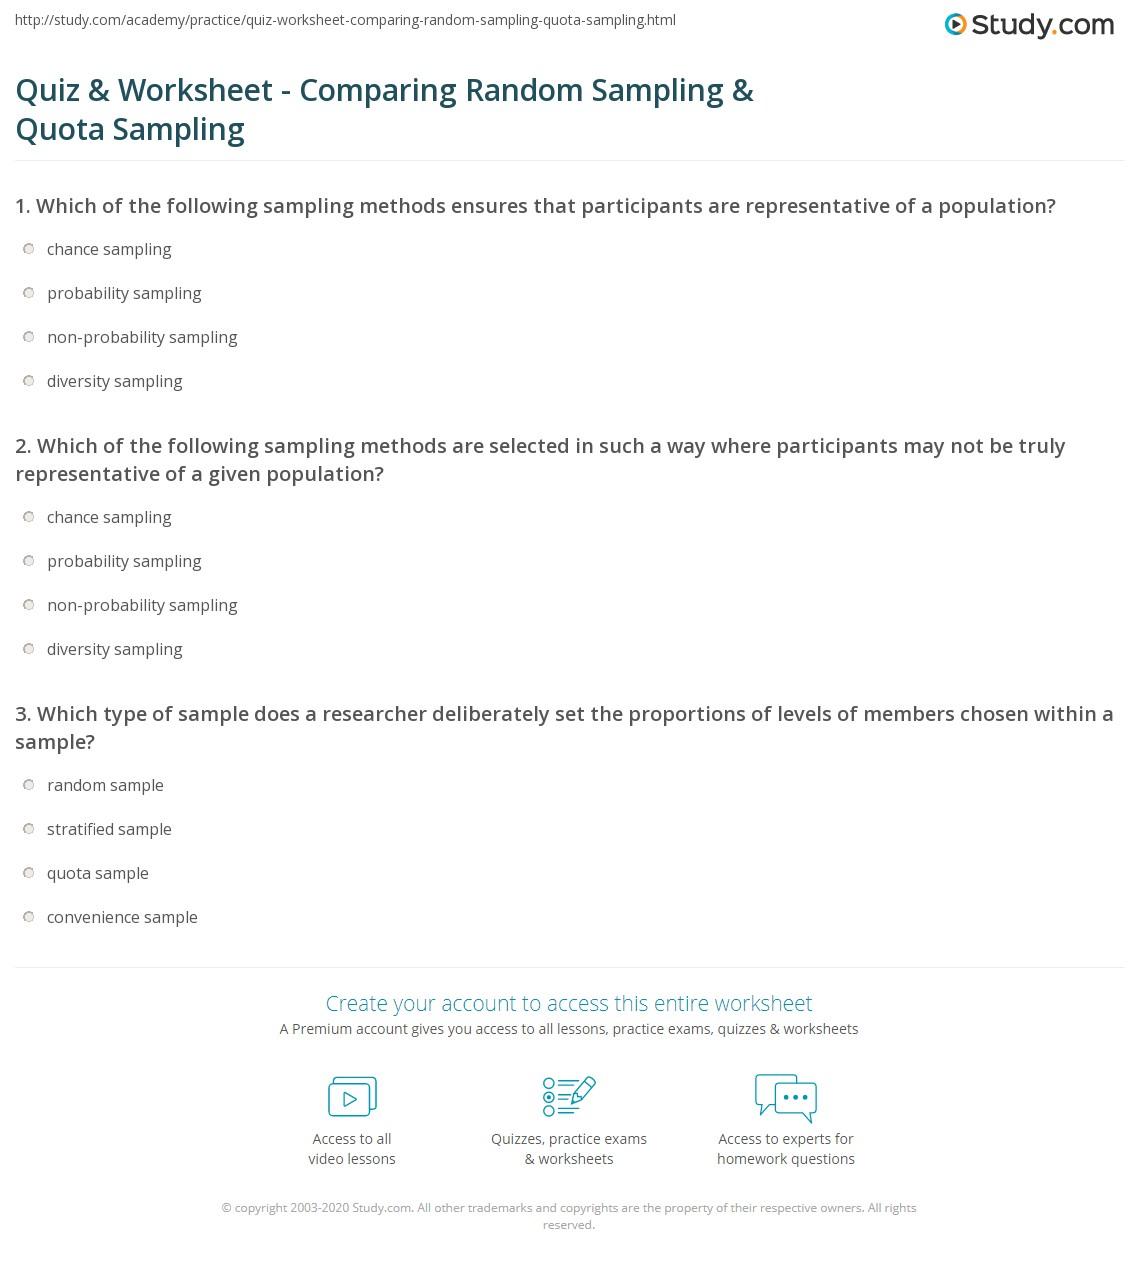 Quiz & Worksheet - Comparing Random Sampling & Quota Sampling ...